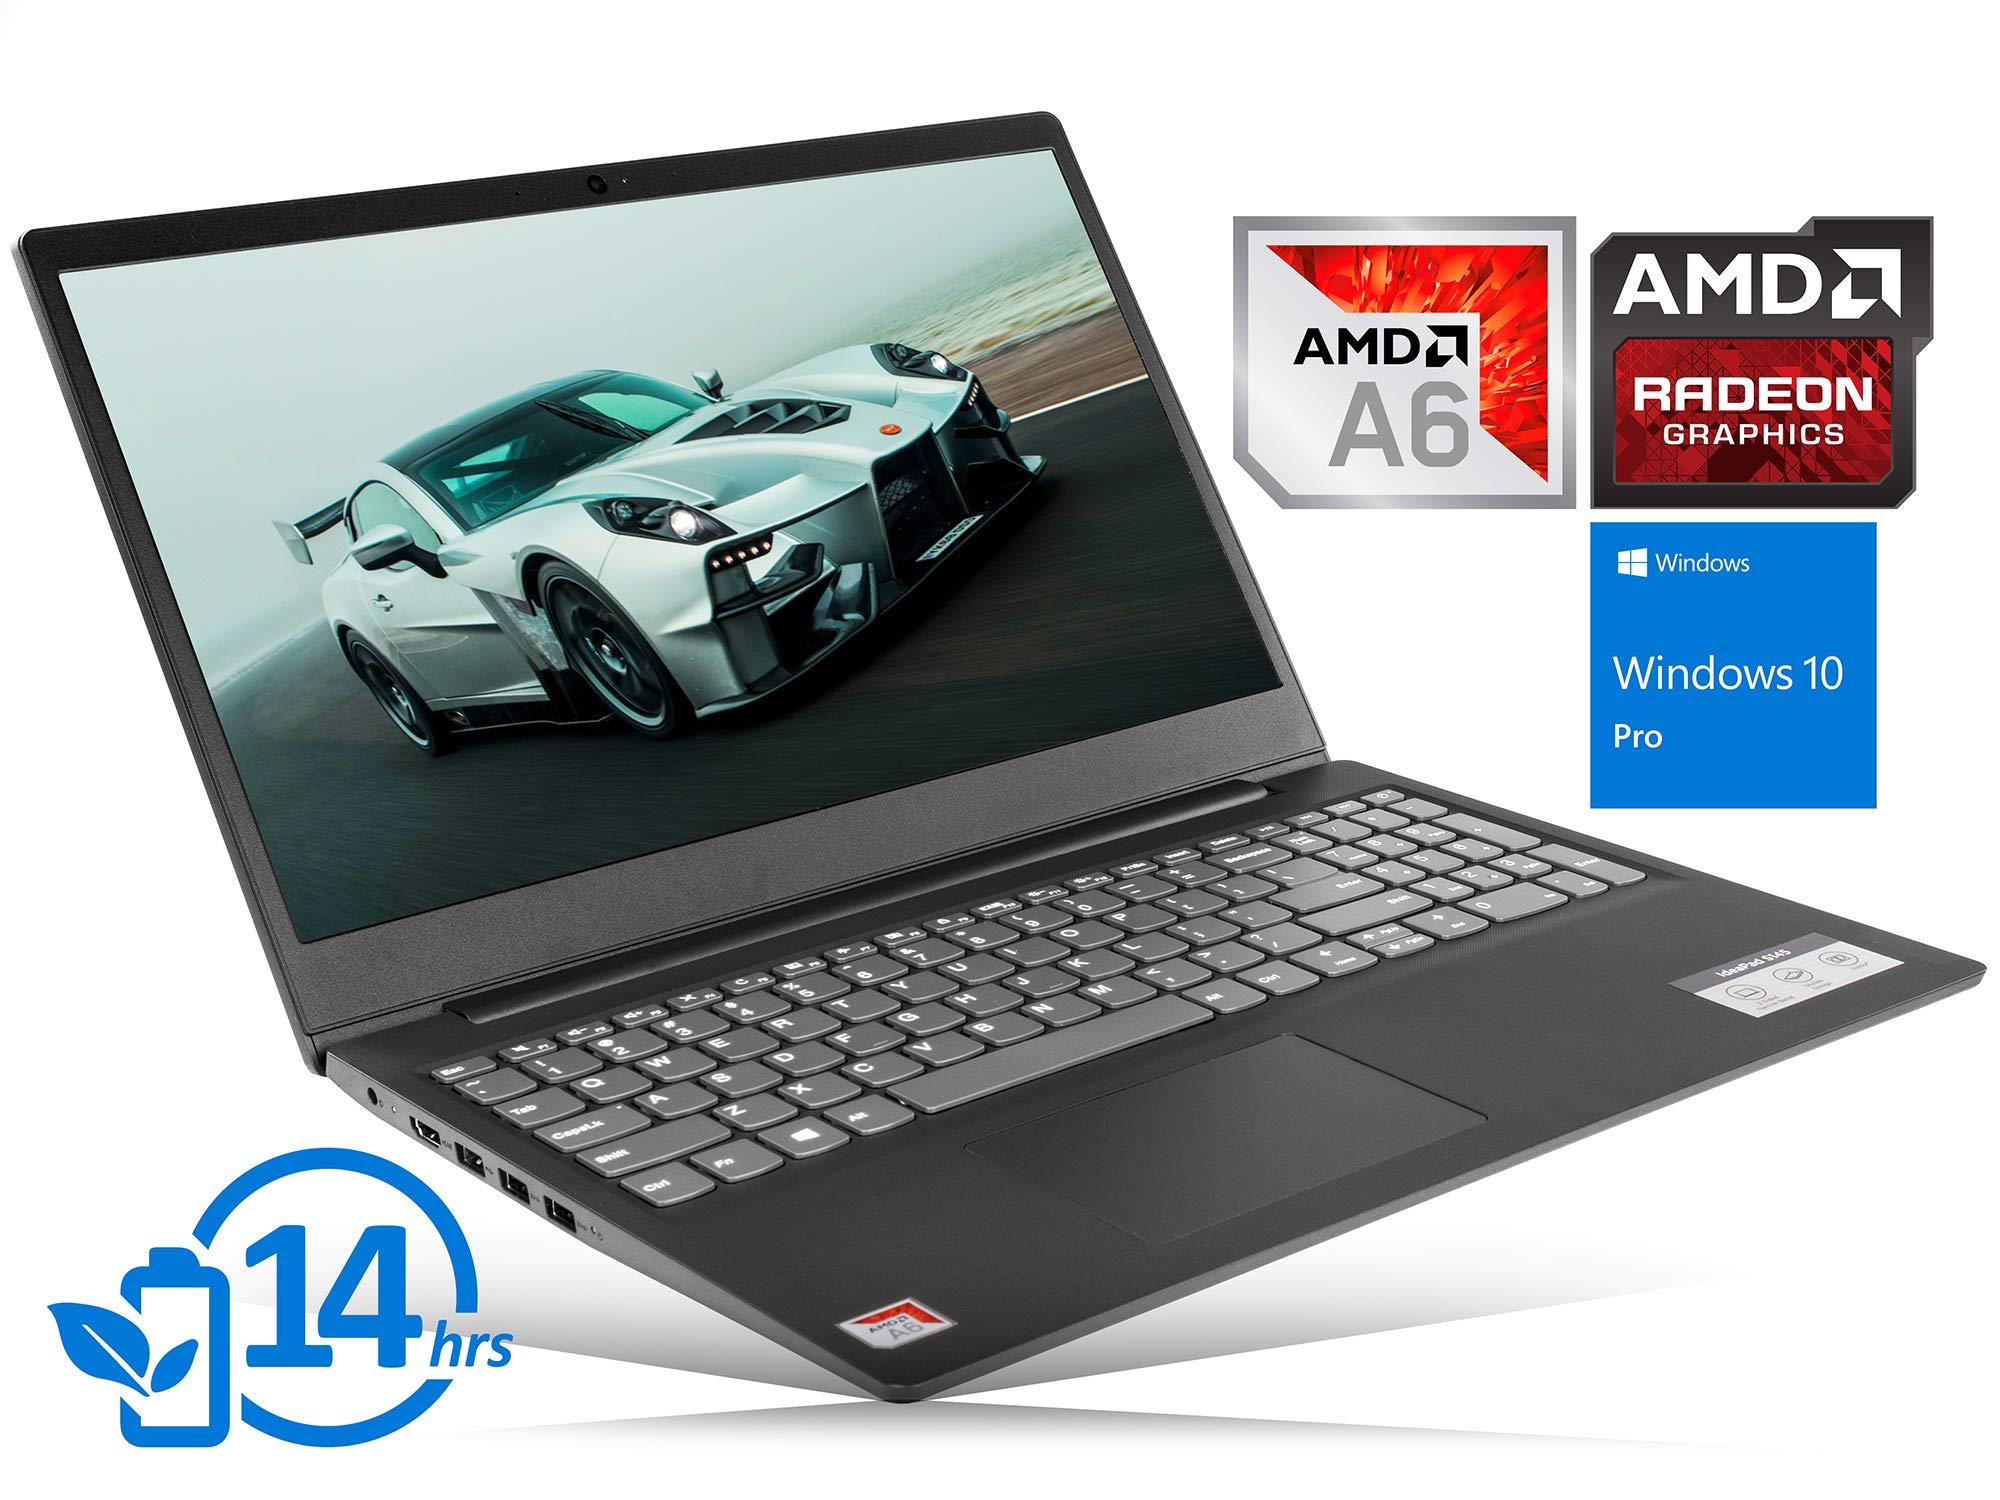 "Lenovo IdeaPad S145 Laptop, 15.6"" HD Display, AMD A6-9225 Upto 3.0GHz, 8GB RAM, 512GB SSD, HDMI, Card Reader, Wi-Fi, Bluetooth, Windows 10 Pro"